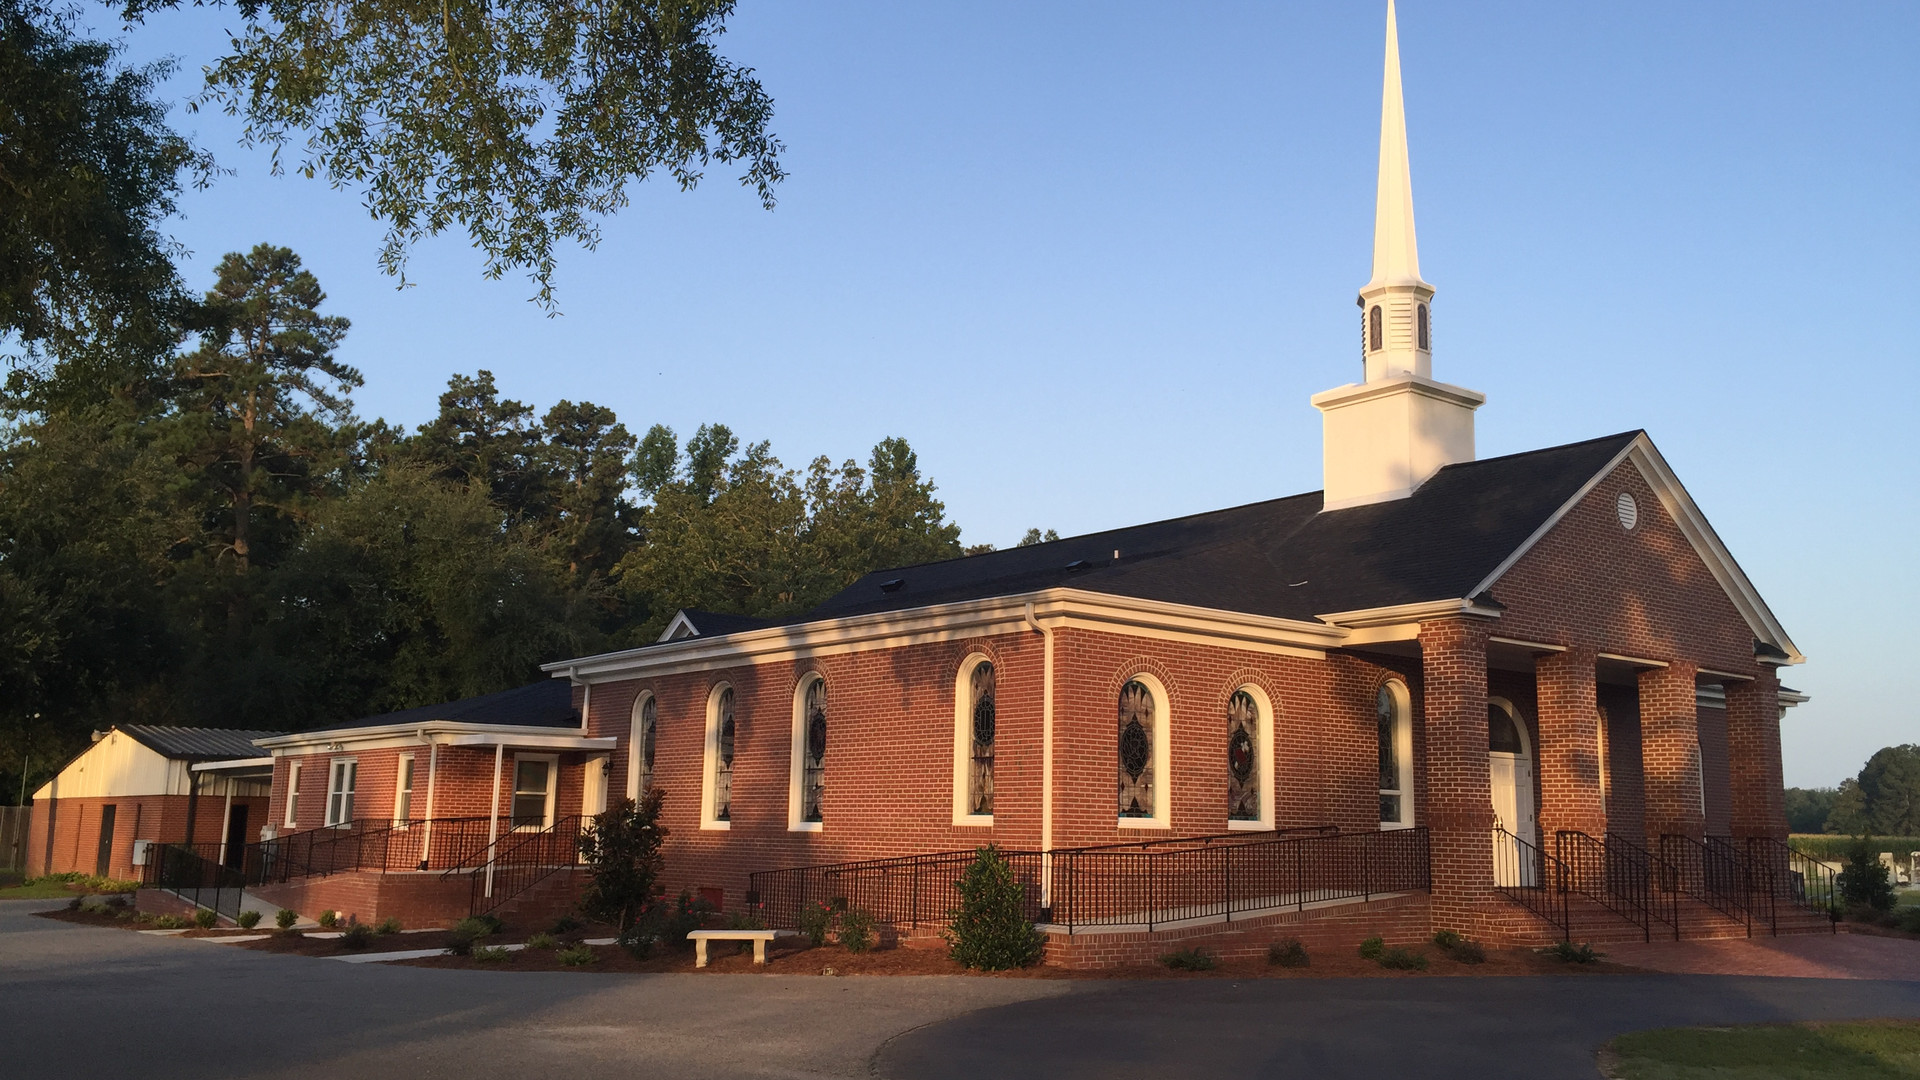 New church addition